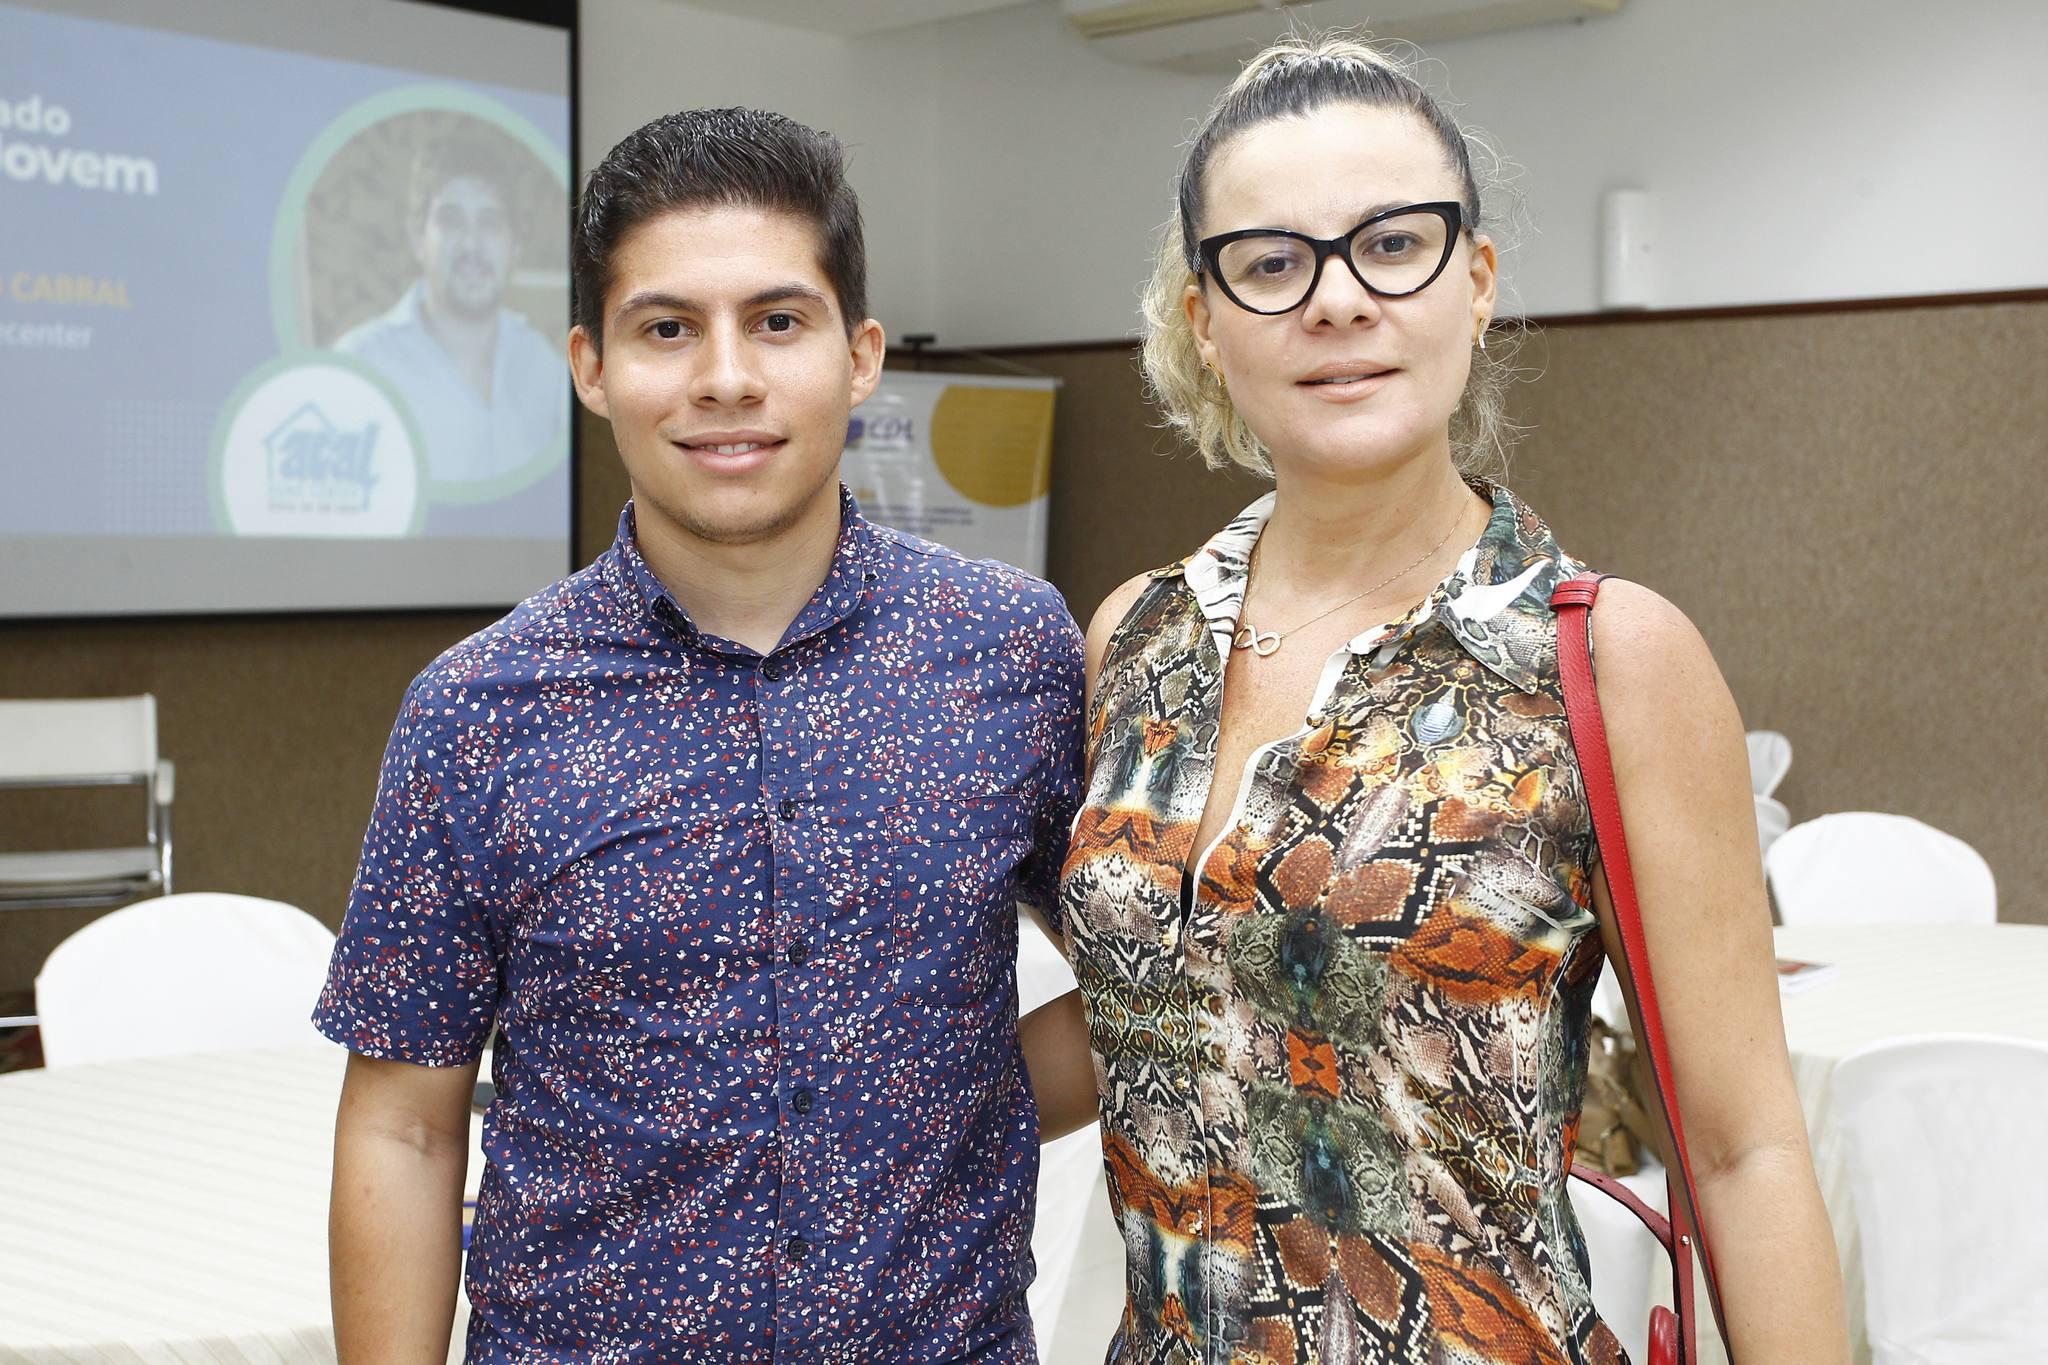 Matheus E Eliene Ferreira